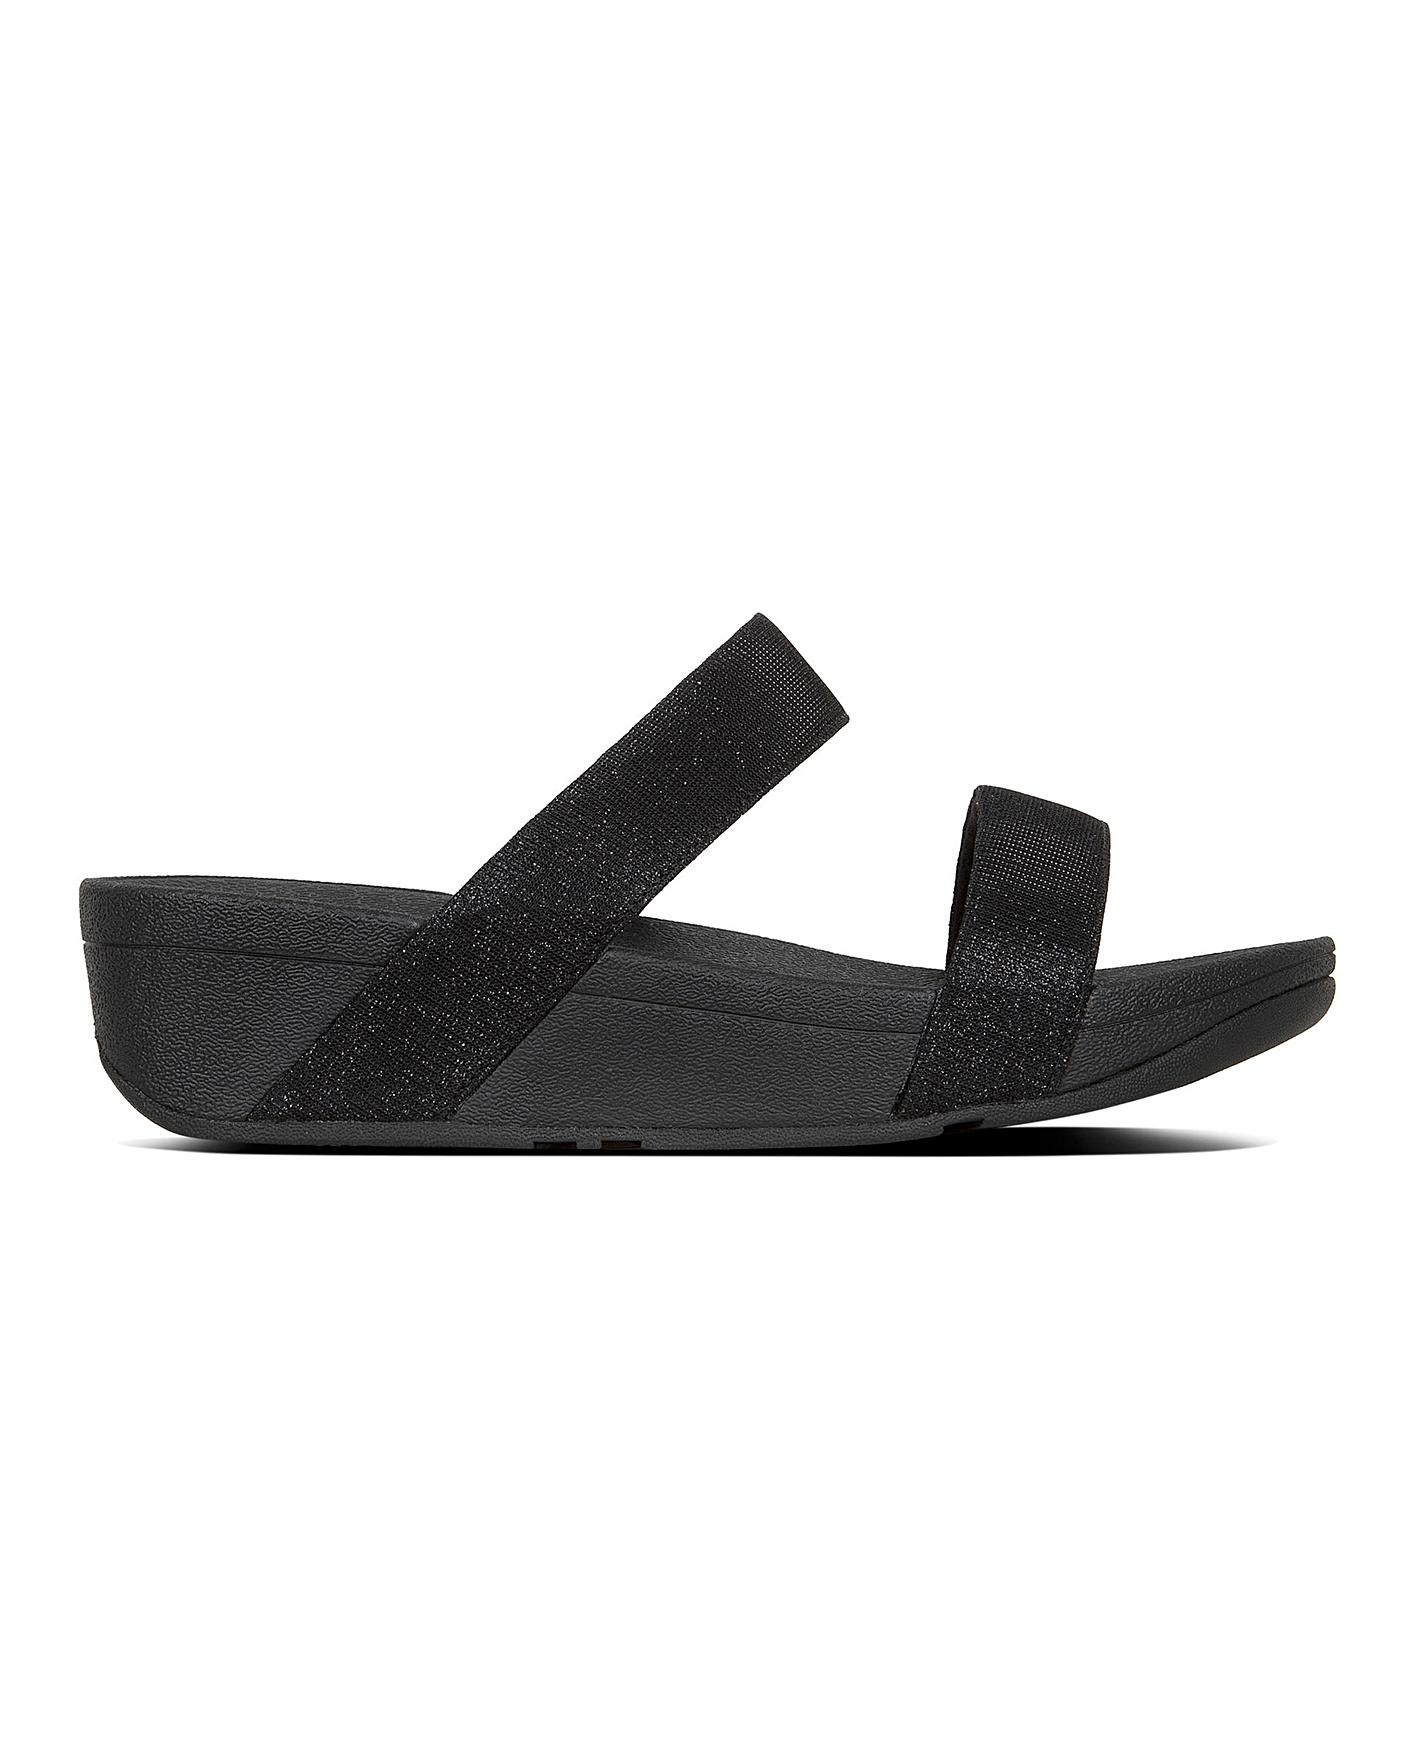 FitFlop Lottie Sandals | Oxendales